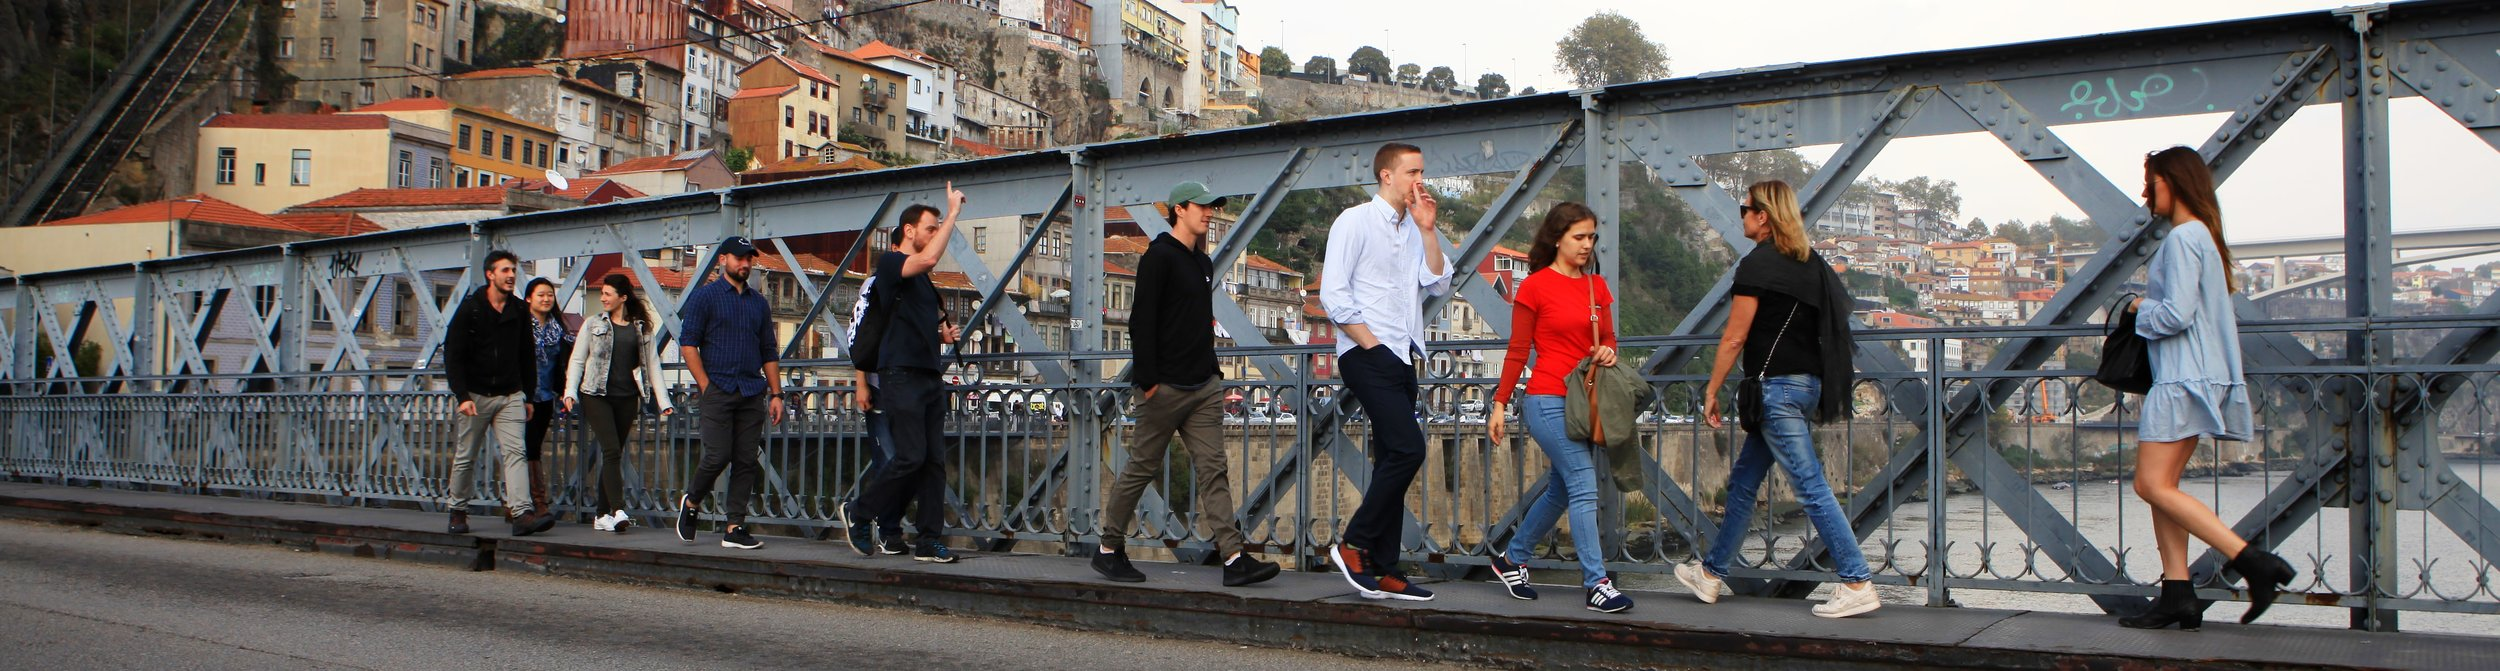 walking-bridge-min.jpg